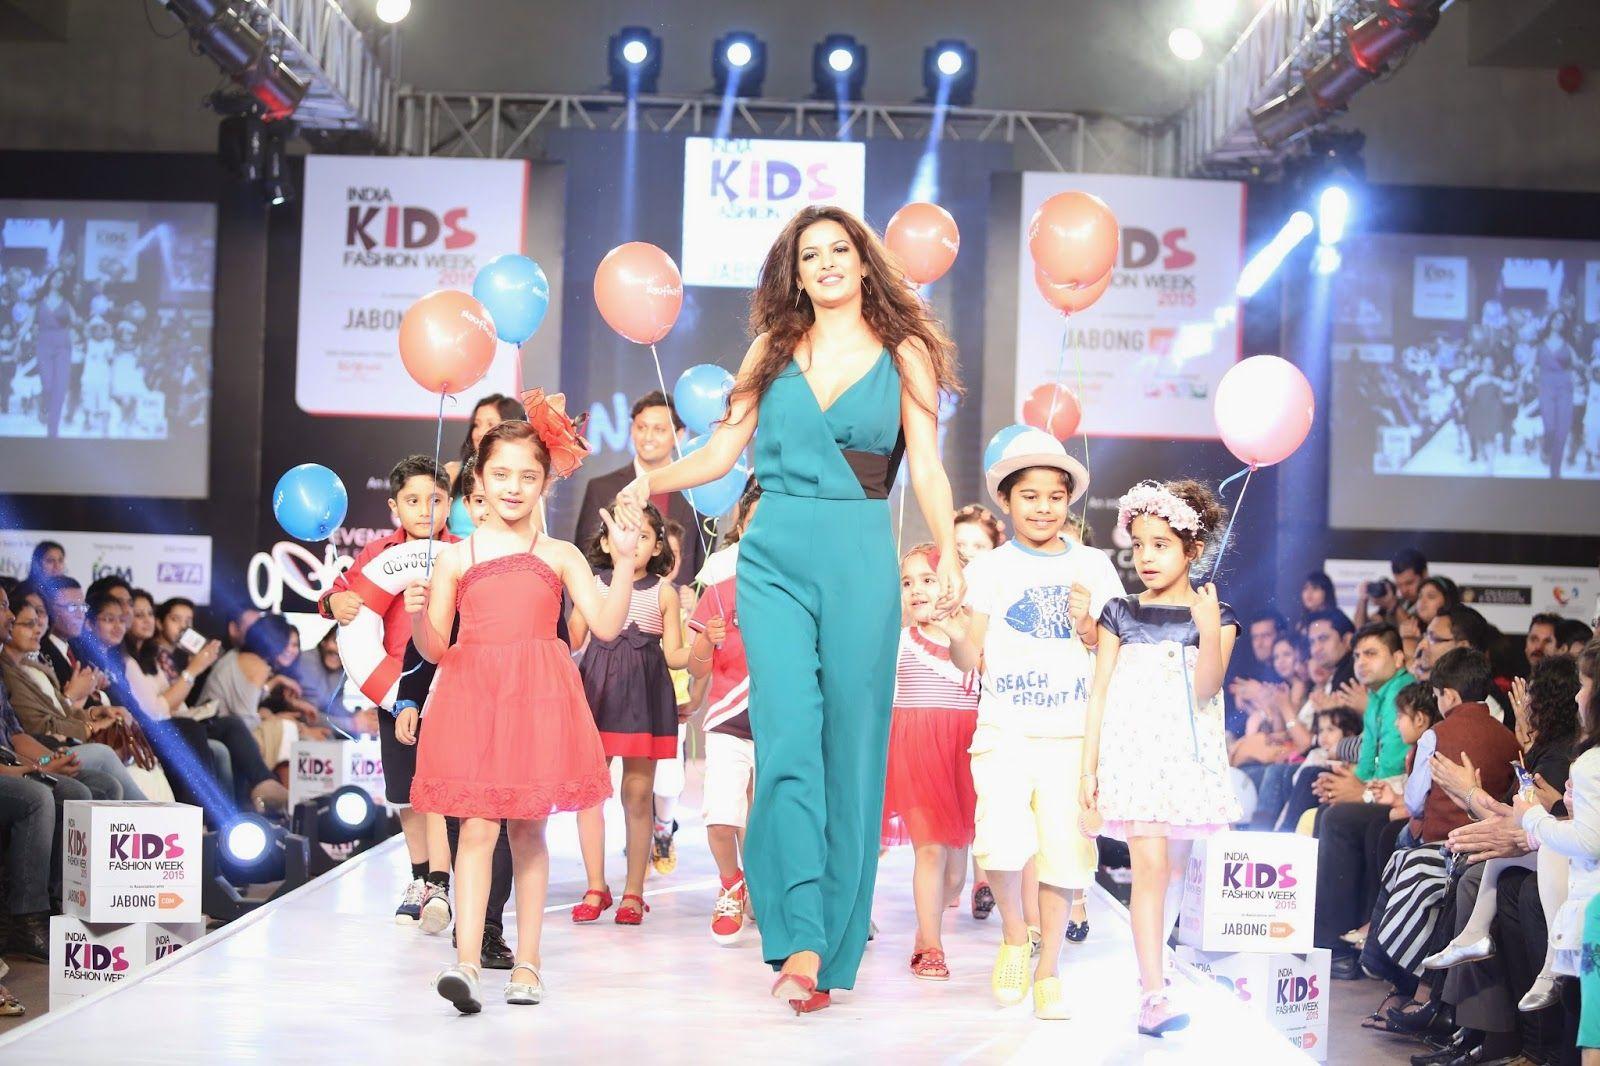 #DelhiKids get high on #fashion on day two of the #IKFW2015 #ChefKunalKapoor #IKFW2015 #IndianKidsFashionweek2015 #Jabong #KarismaKapoor #Maggie #Maxretail #Mimi http://pocketnewsalert.blogspot.com/2015/03/Delhi-Kids-get-high-on-fashion-on-day-two-of-the-IKFW-2015.html